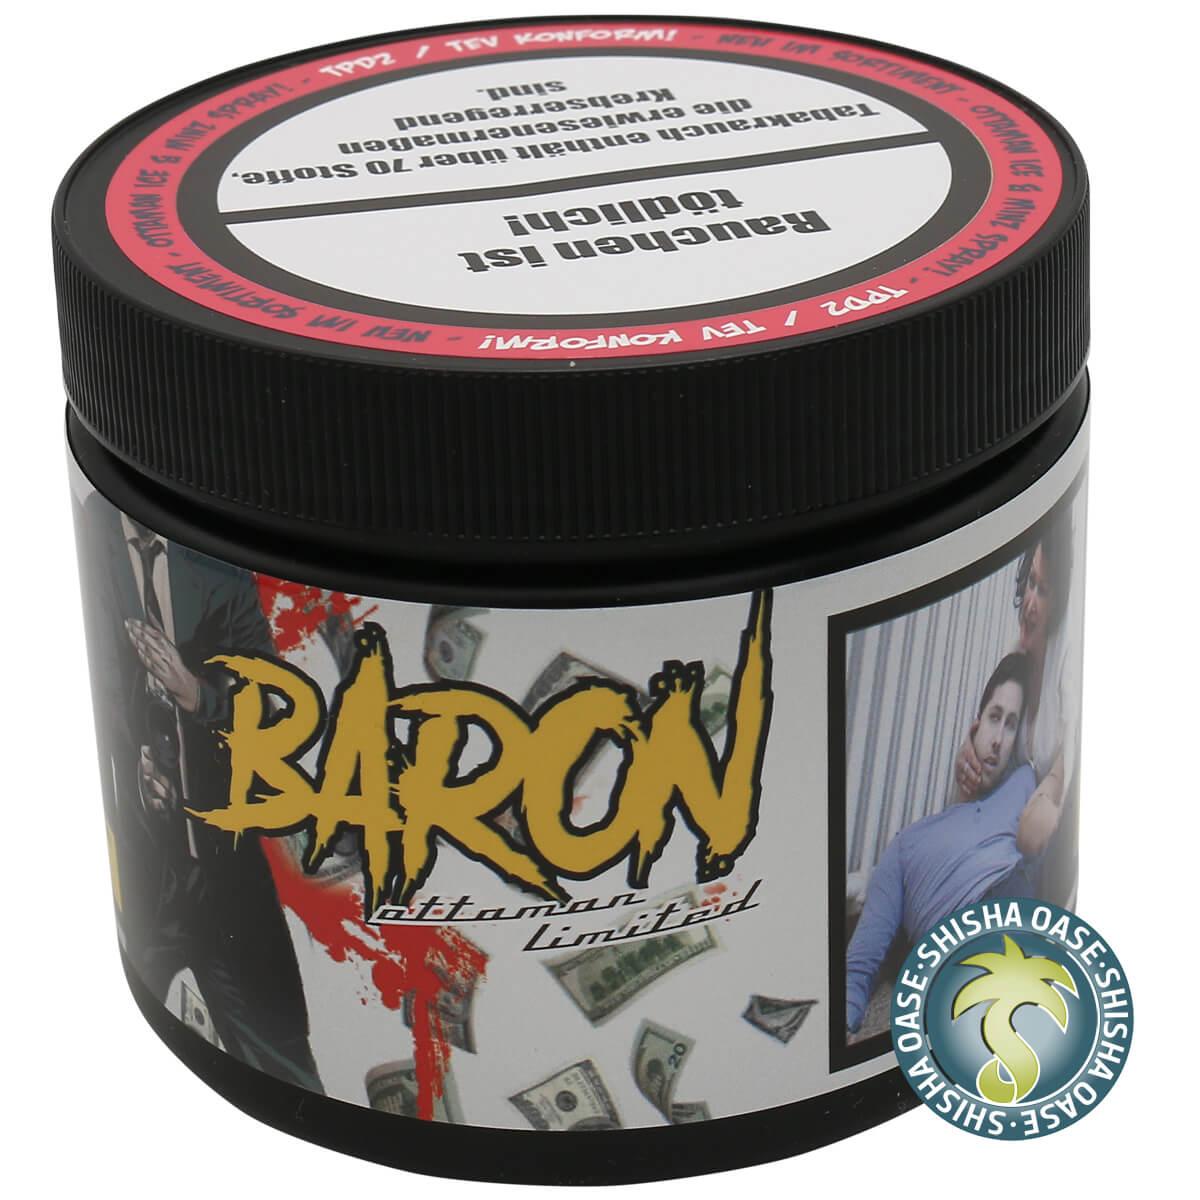 Ottaman Tabak 200g | Baron